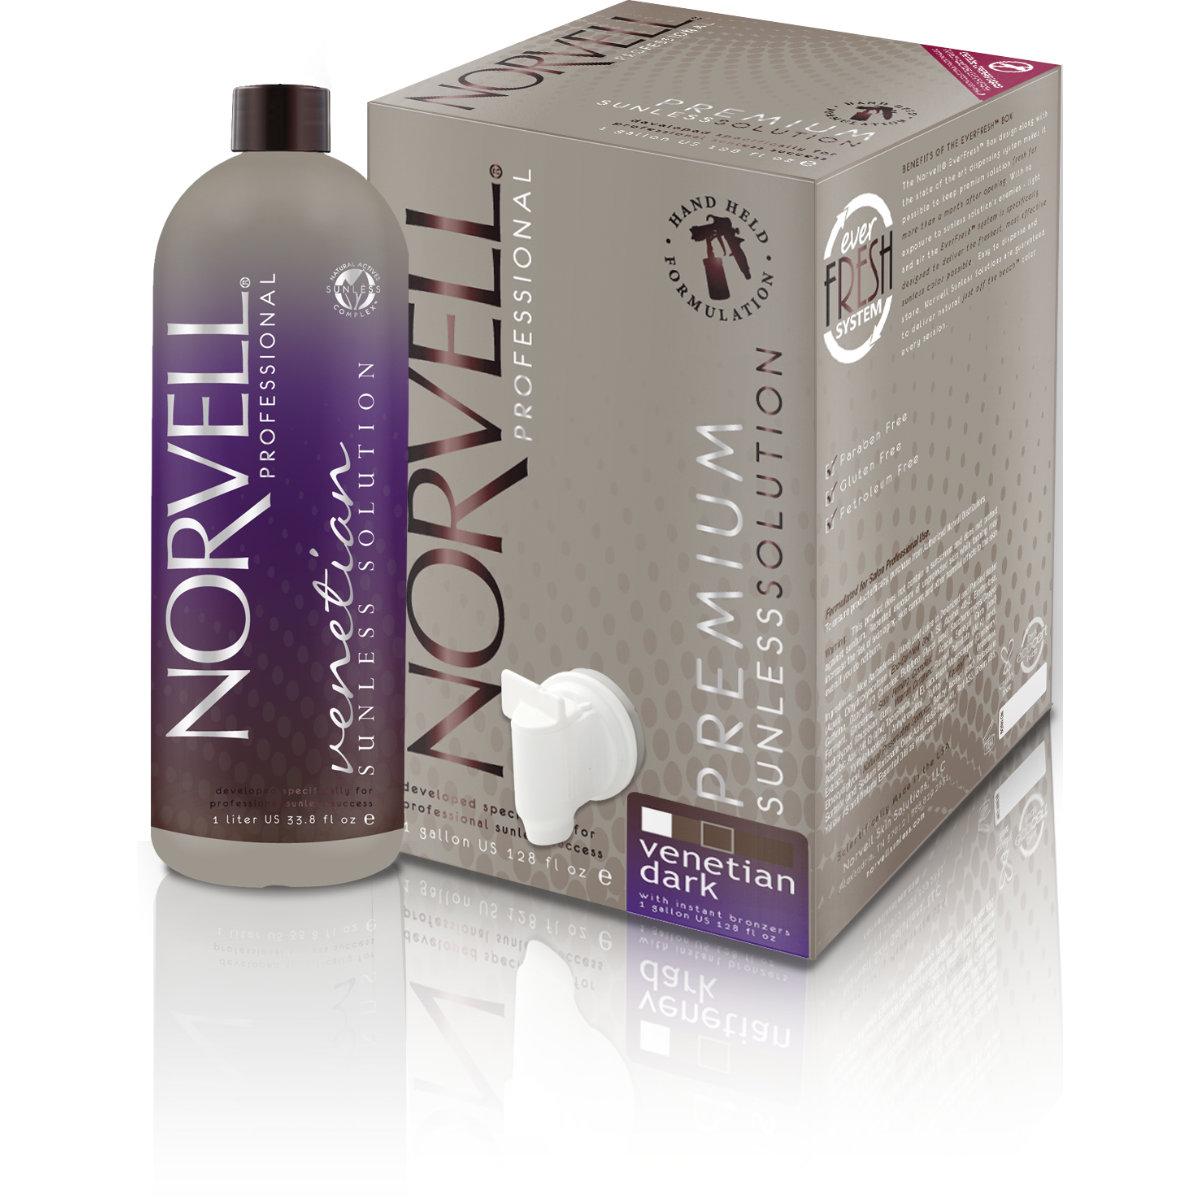 Norvell VENETIAN Premium Handheld Solution